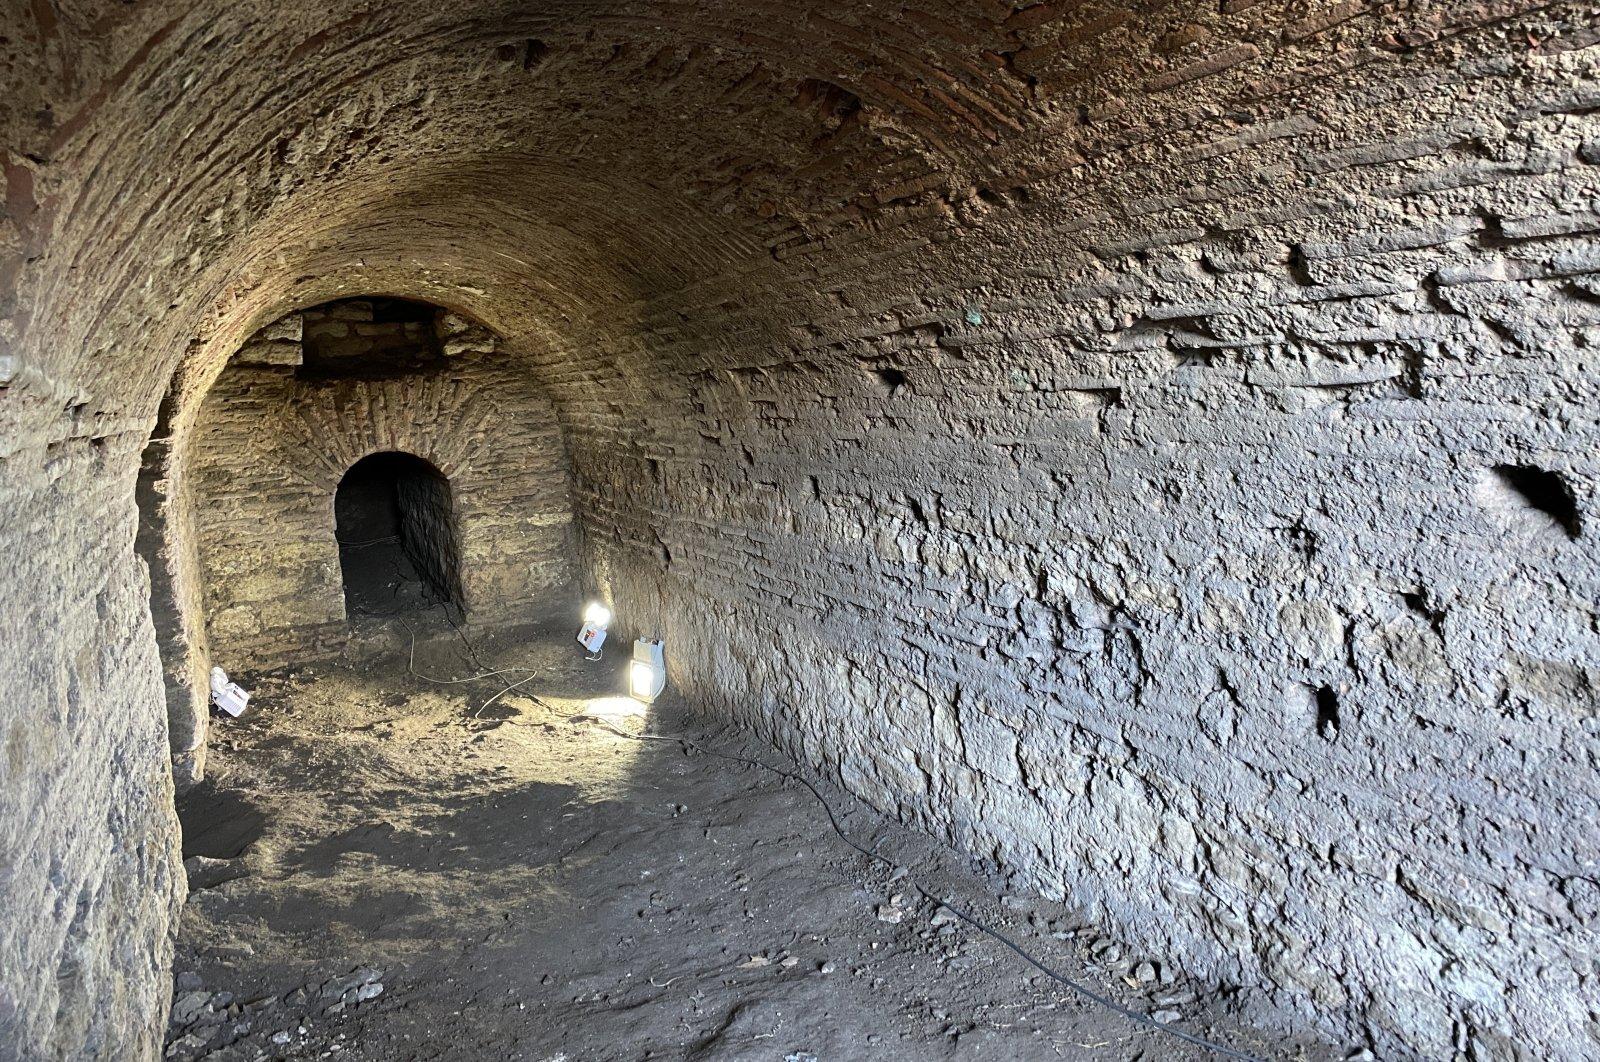 Roman-era gallery discovered beneath Istanbul's Topkapı Palace